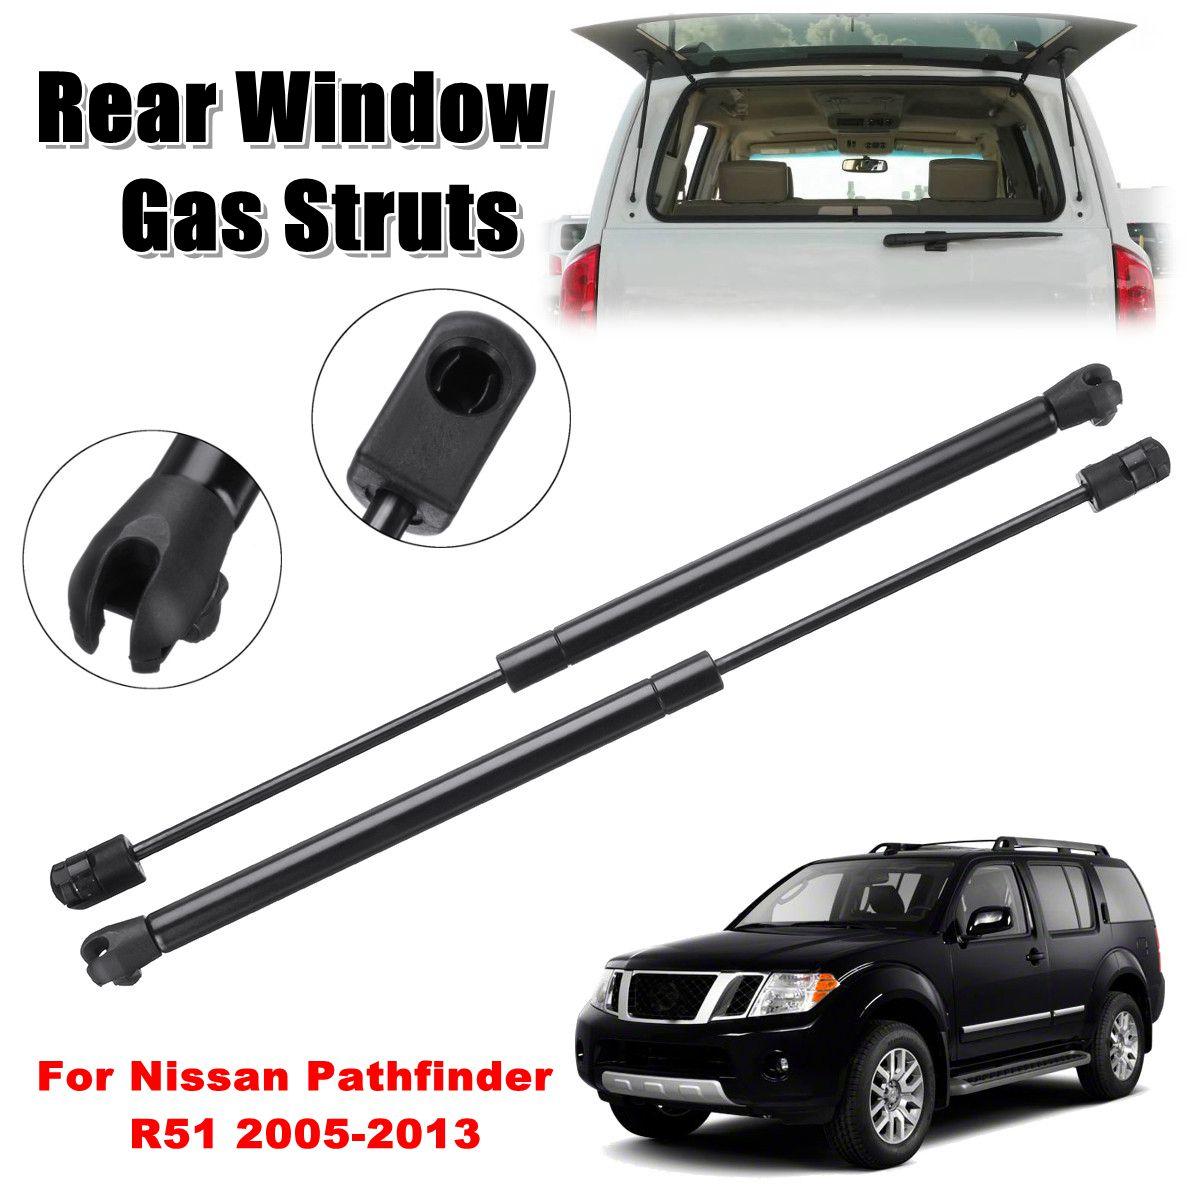 2pcs Rear Window Glass Gas Struts Support Sring For Nissan Pathfinder R51 2005-2013 90460ZL90A2pcs Rear Window Glass Gas Struts Support Sring For Nissan Pathfinder R51 2005-2013 90460ZL90A